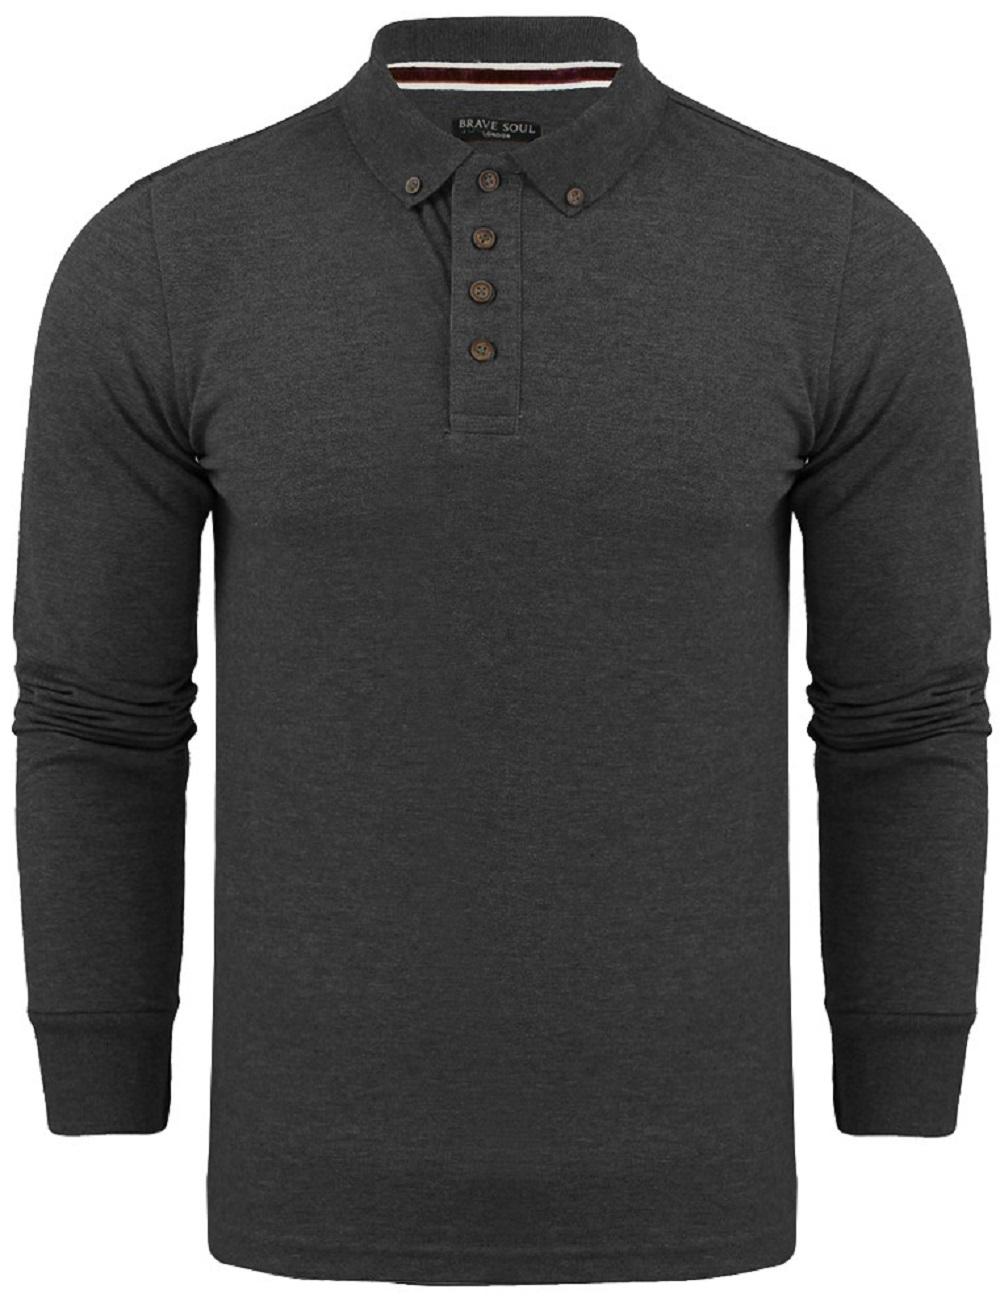 Mens brave soul long sleeve cotton polo t shirt pique for Mens long sleeve casual cotton shirts